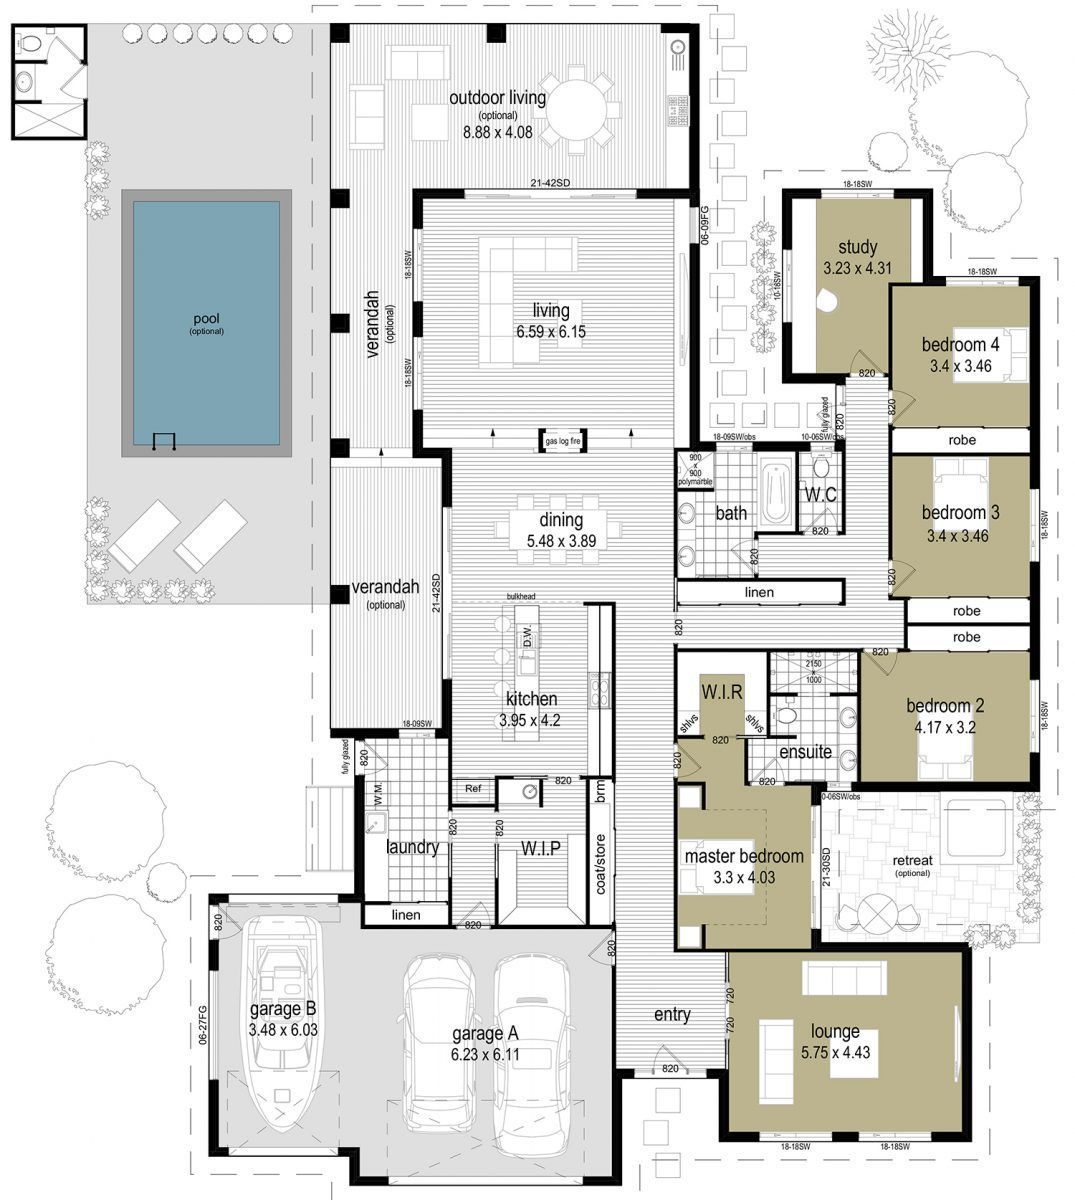 Outdoor Living House Plans In 2020 House Plans Dream House Plans Home Design Floor Plans